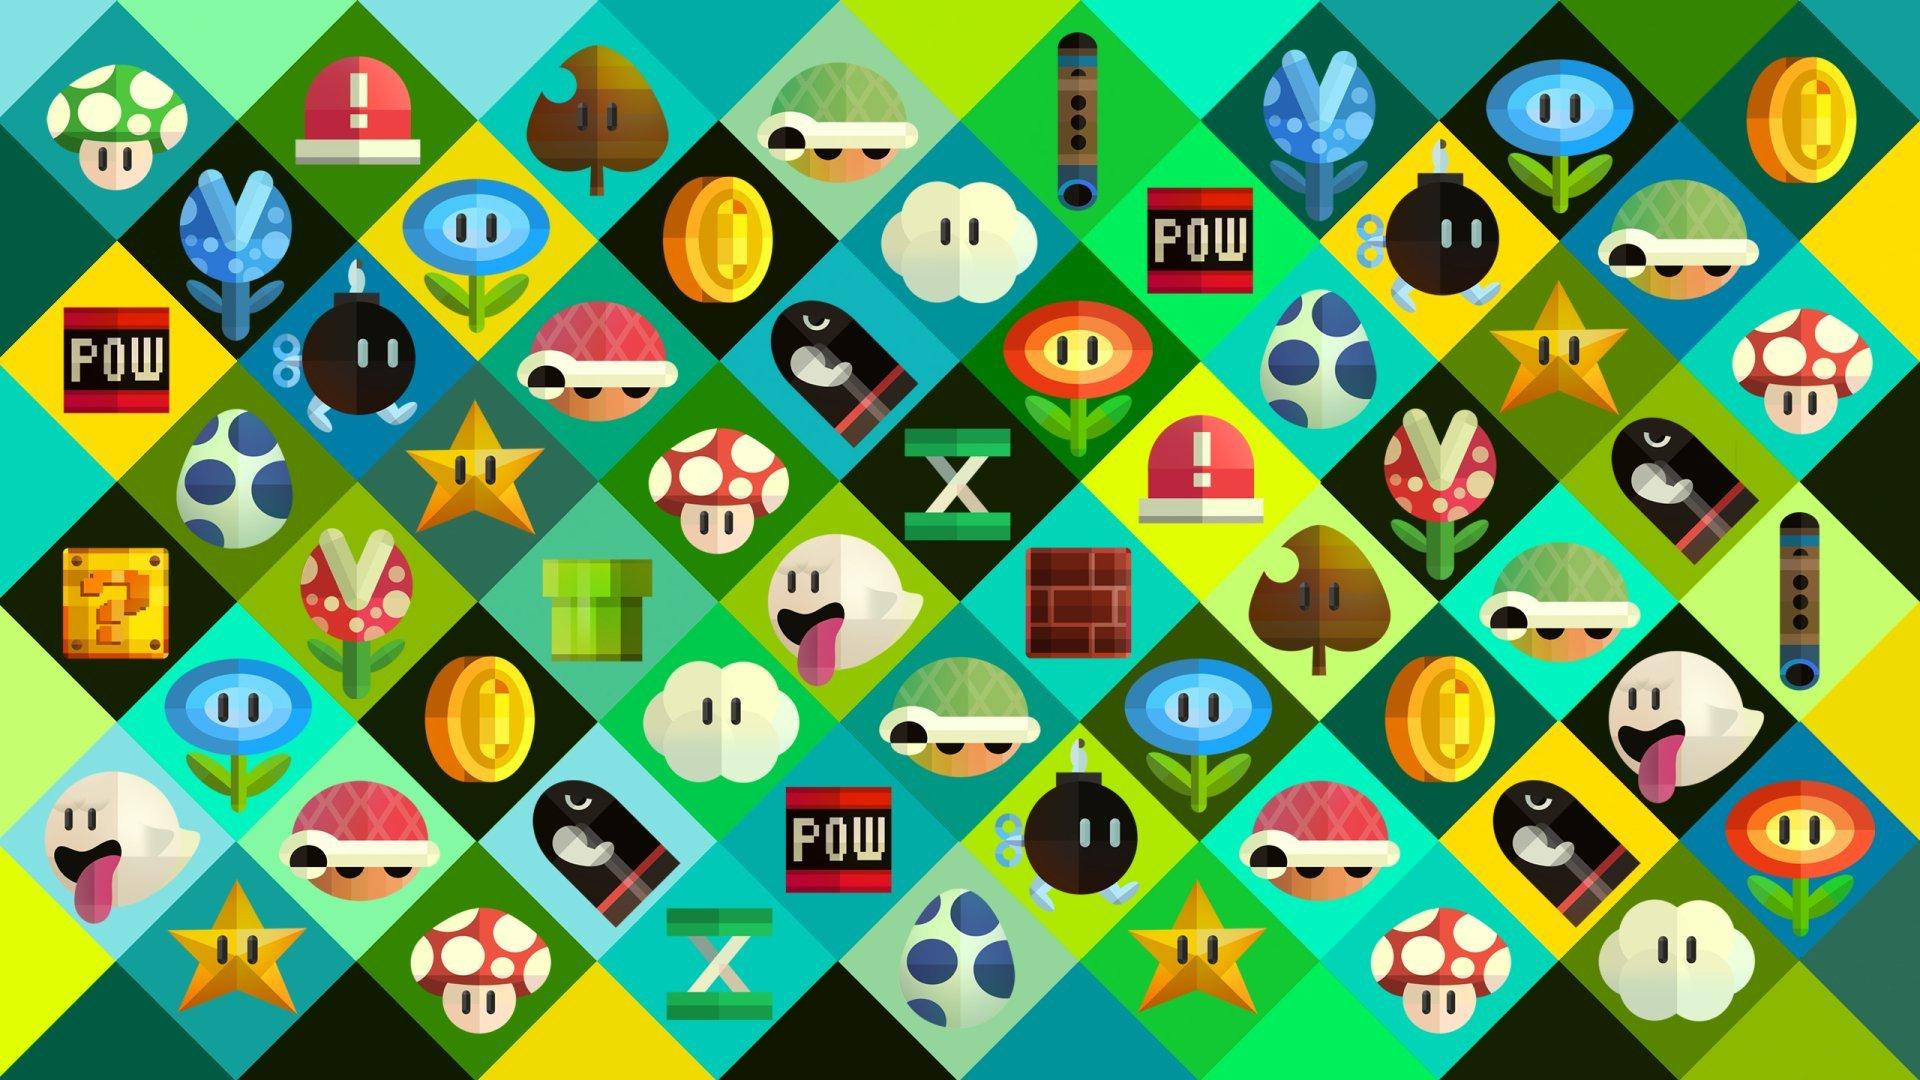 Retro Gaming background wallpaper